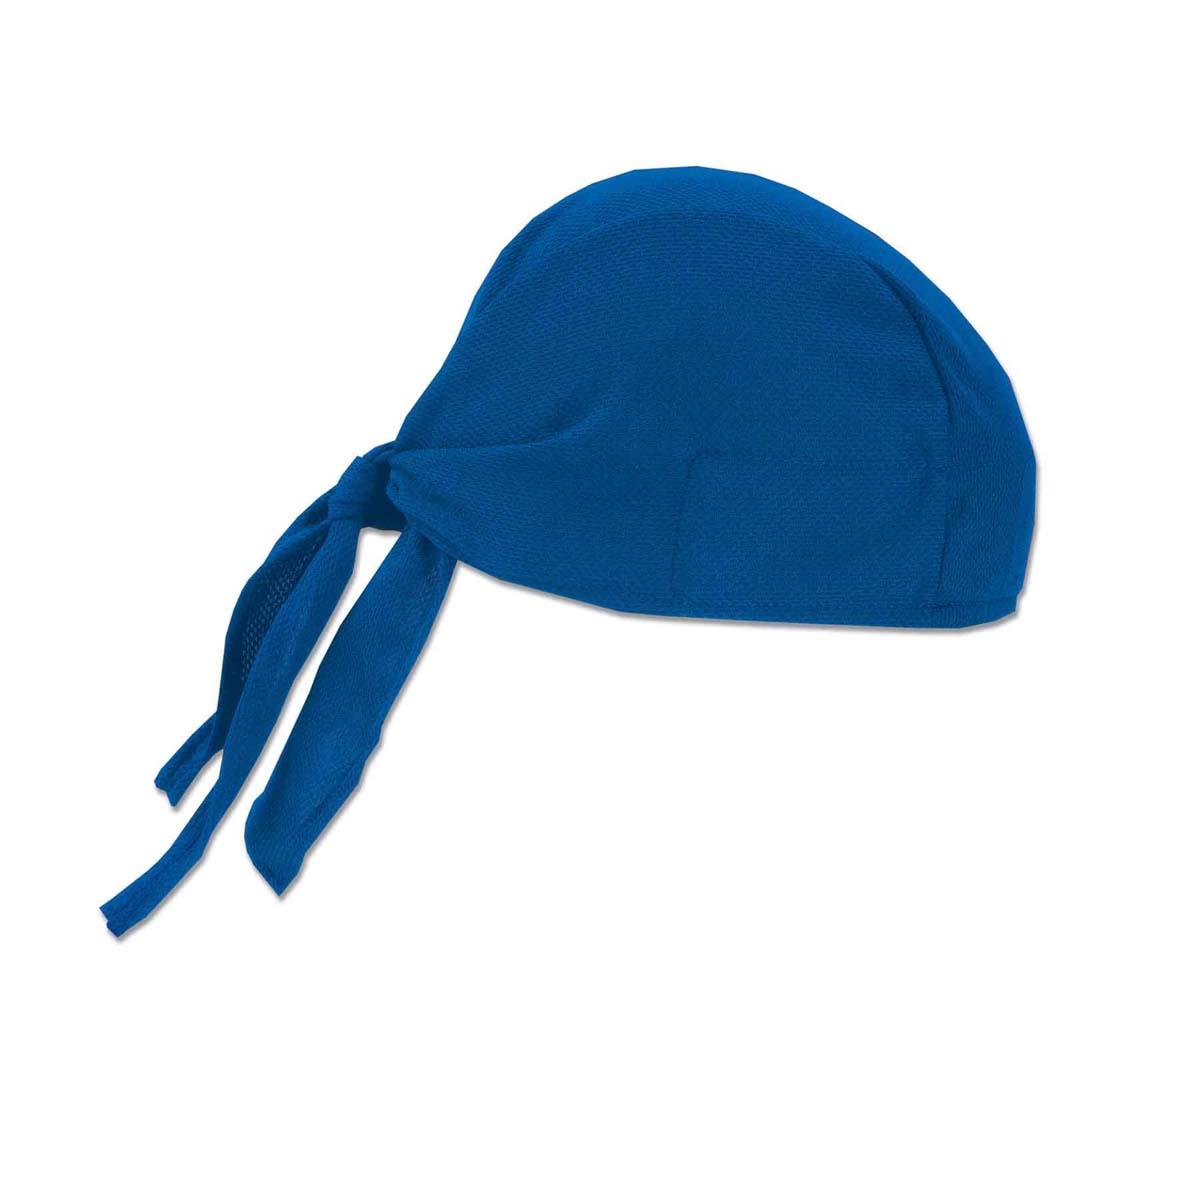 6615  Blue High-Performance Dew Rag